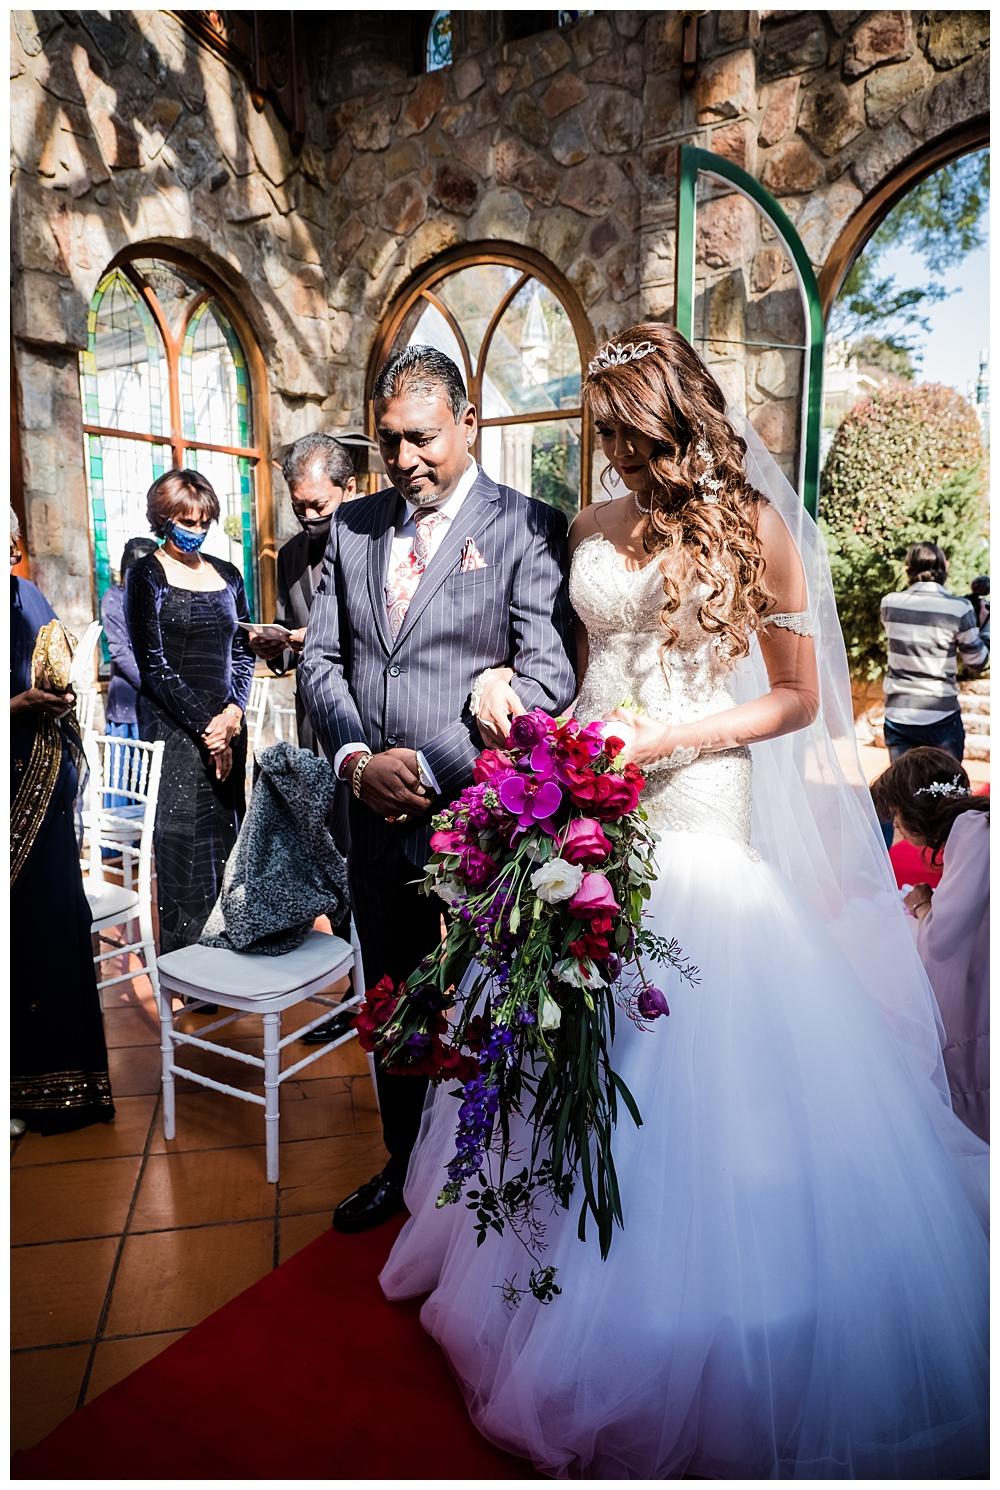 Best_Wedding_Photographer_AlexanderSmith_1802.jpg